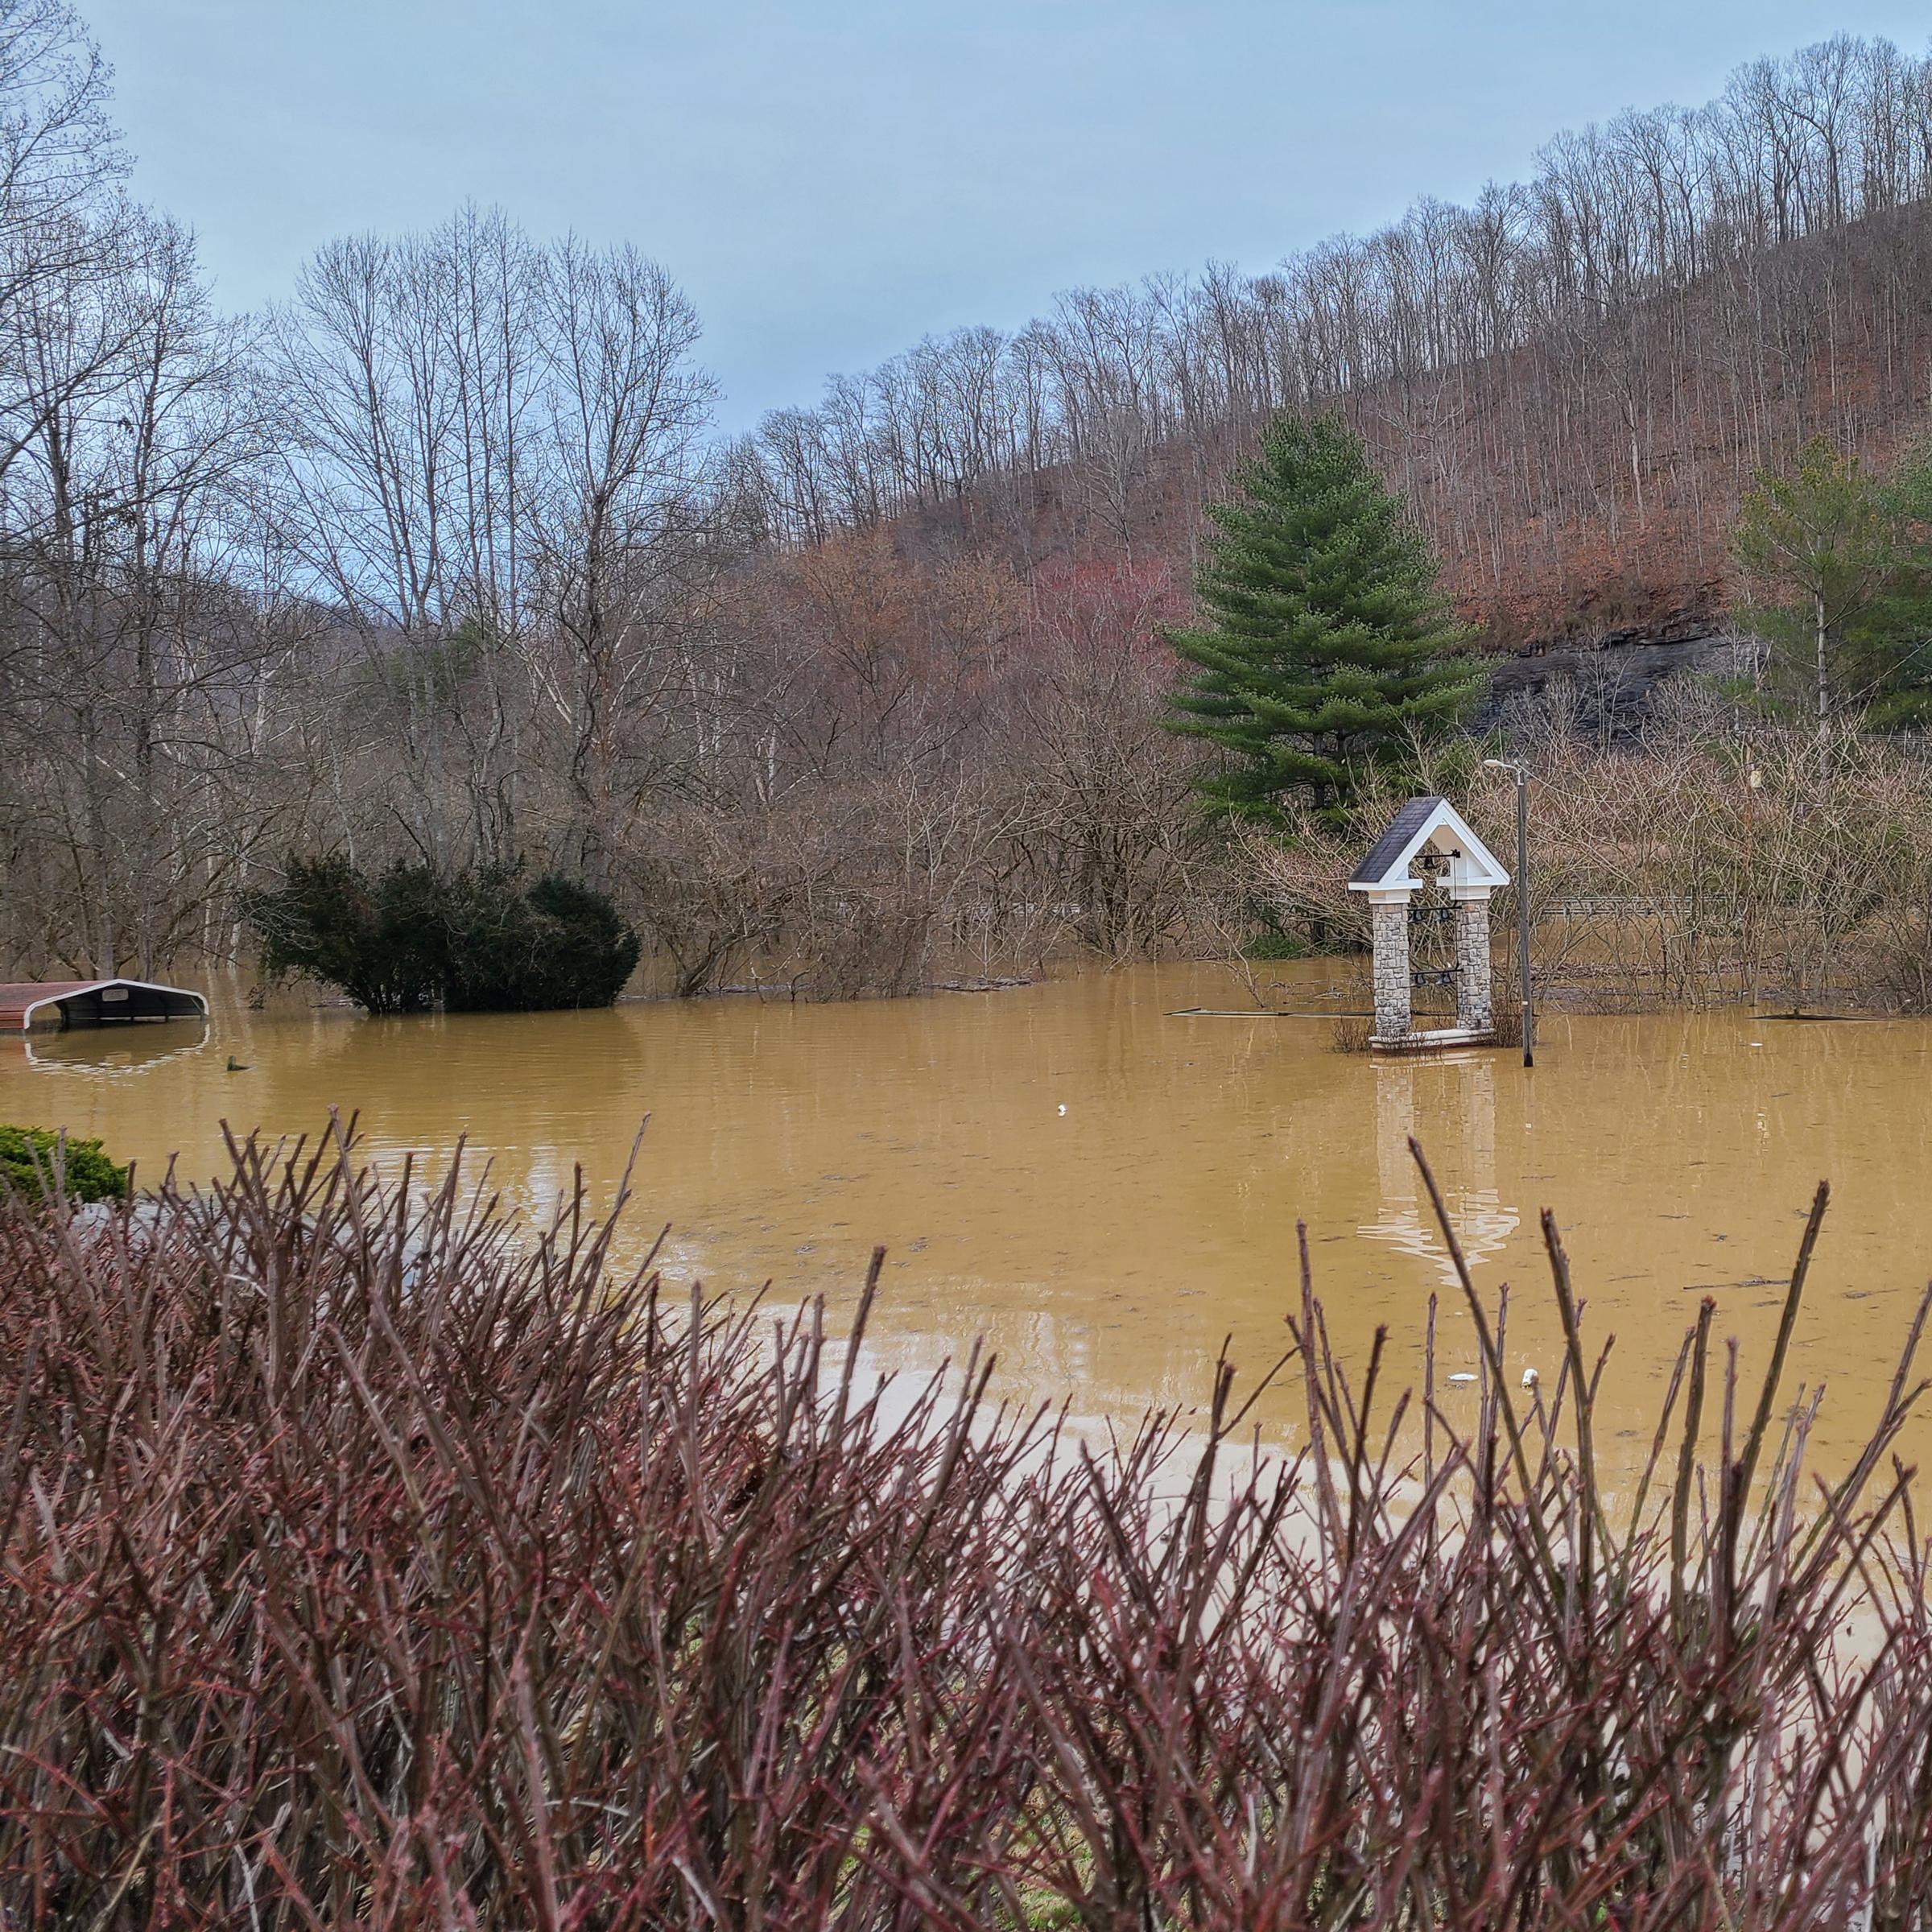 St. Martha, Prestonsburg flooding